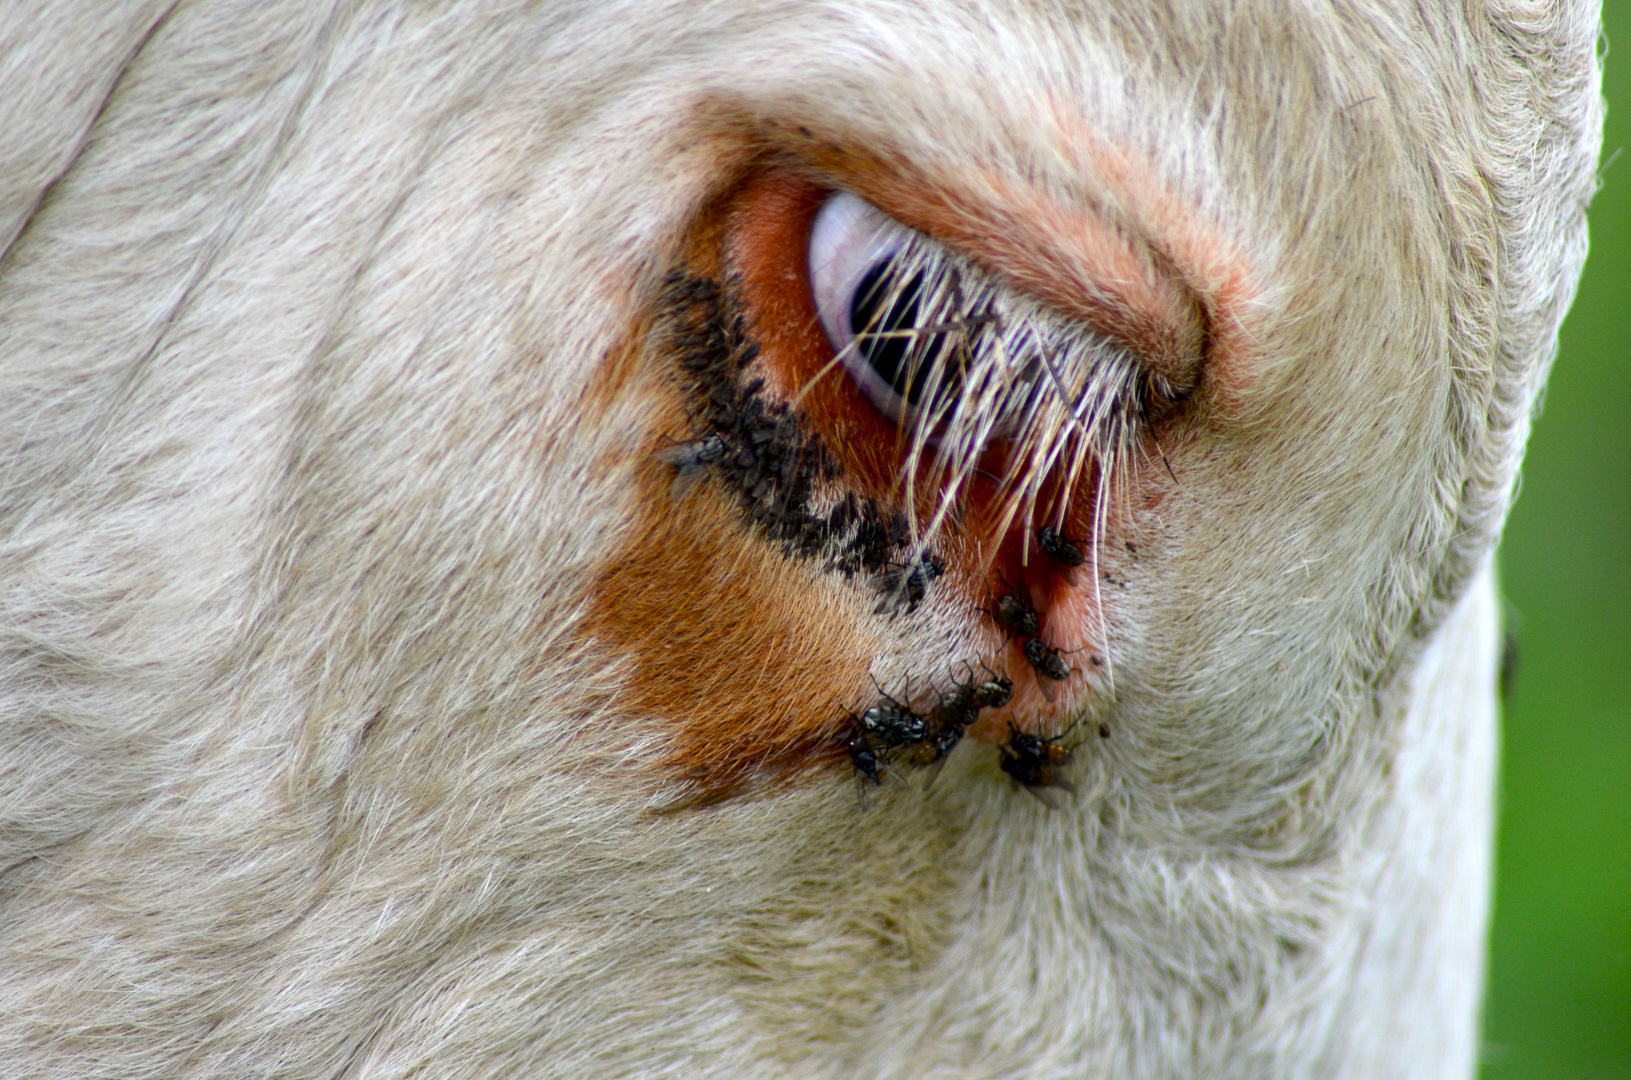 Das Kuh - Auge